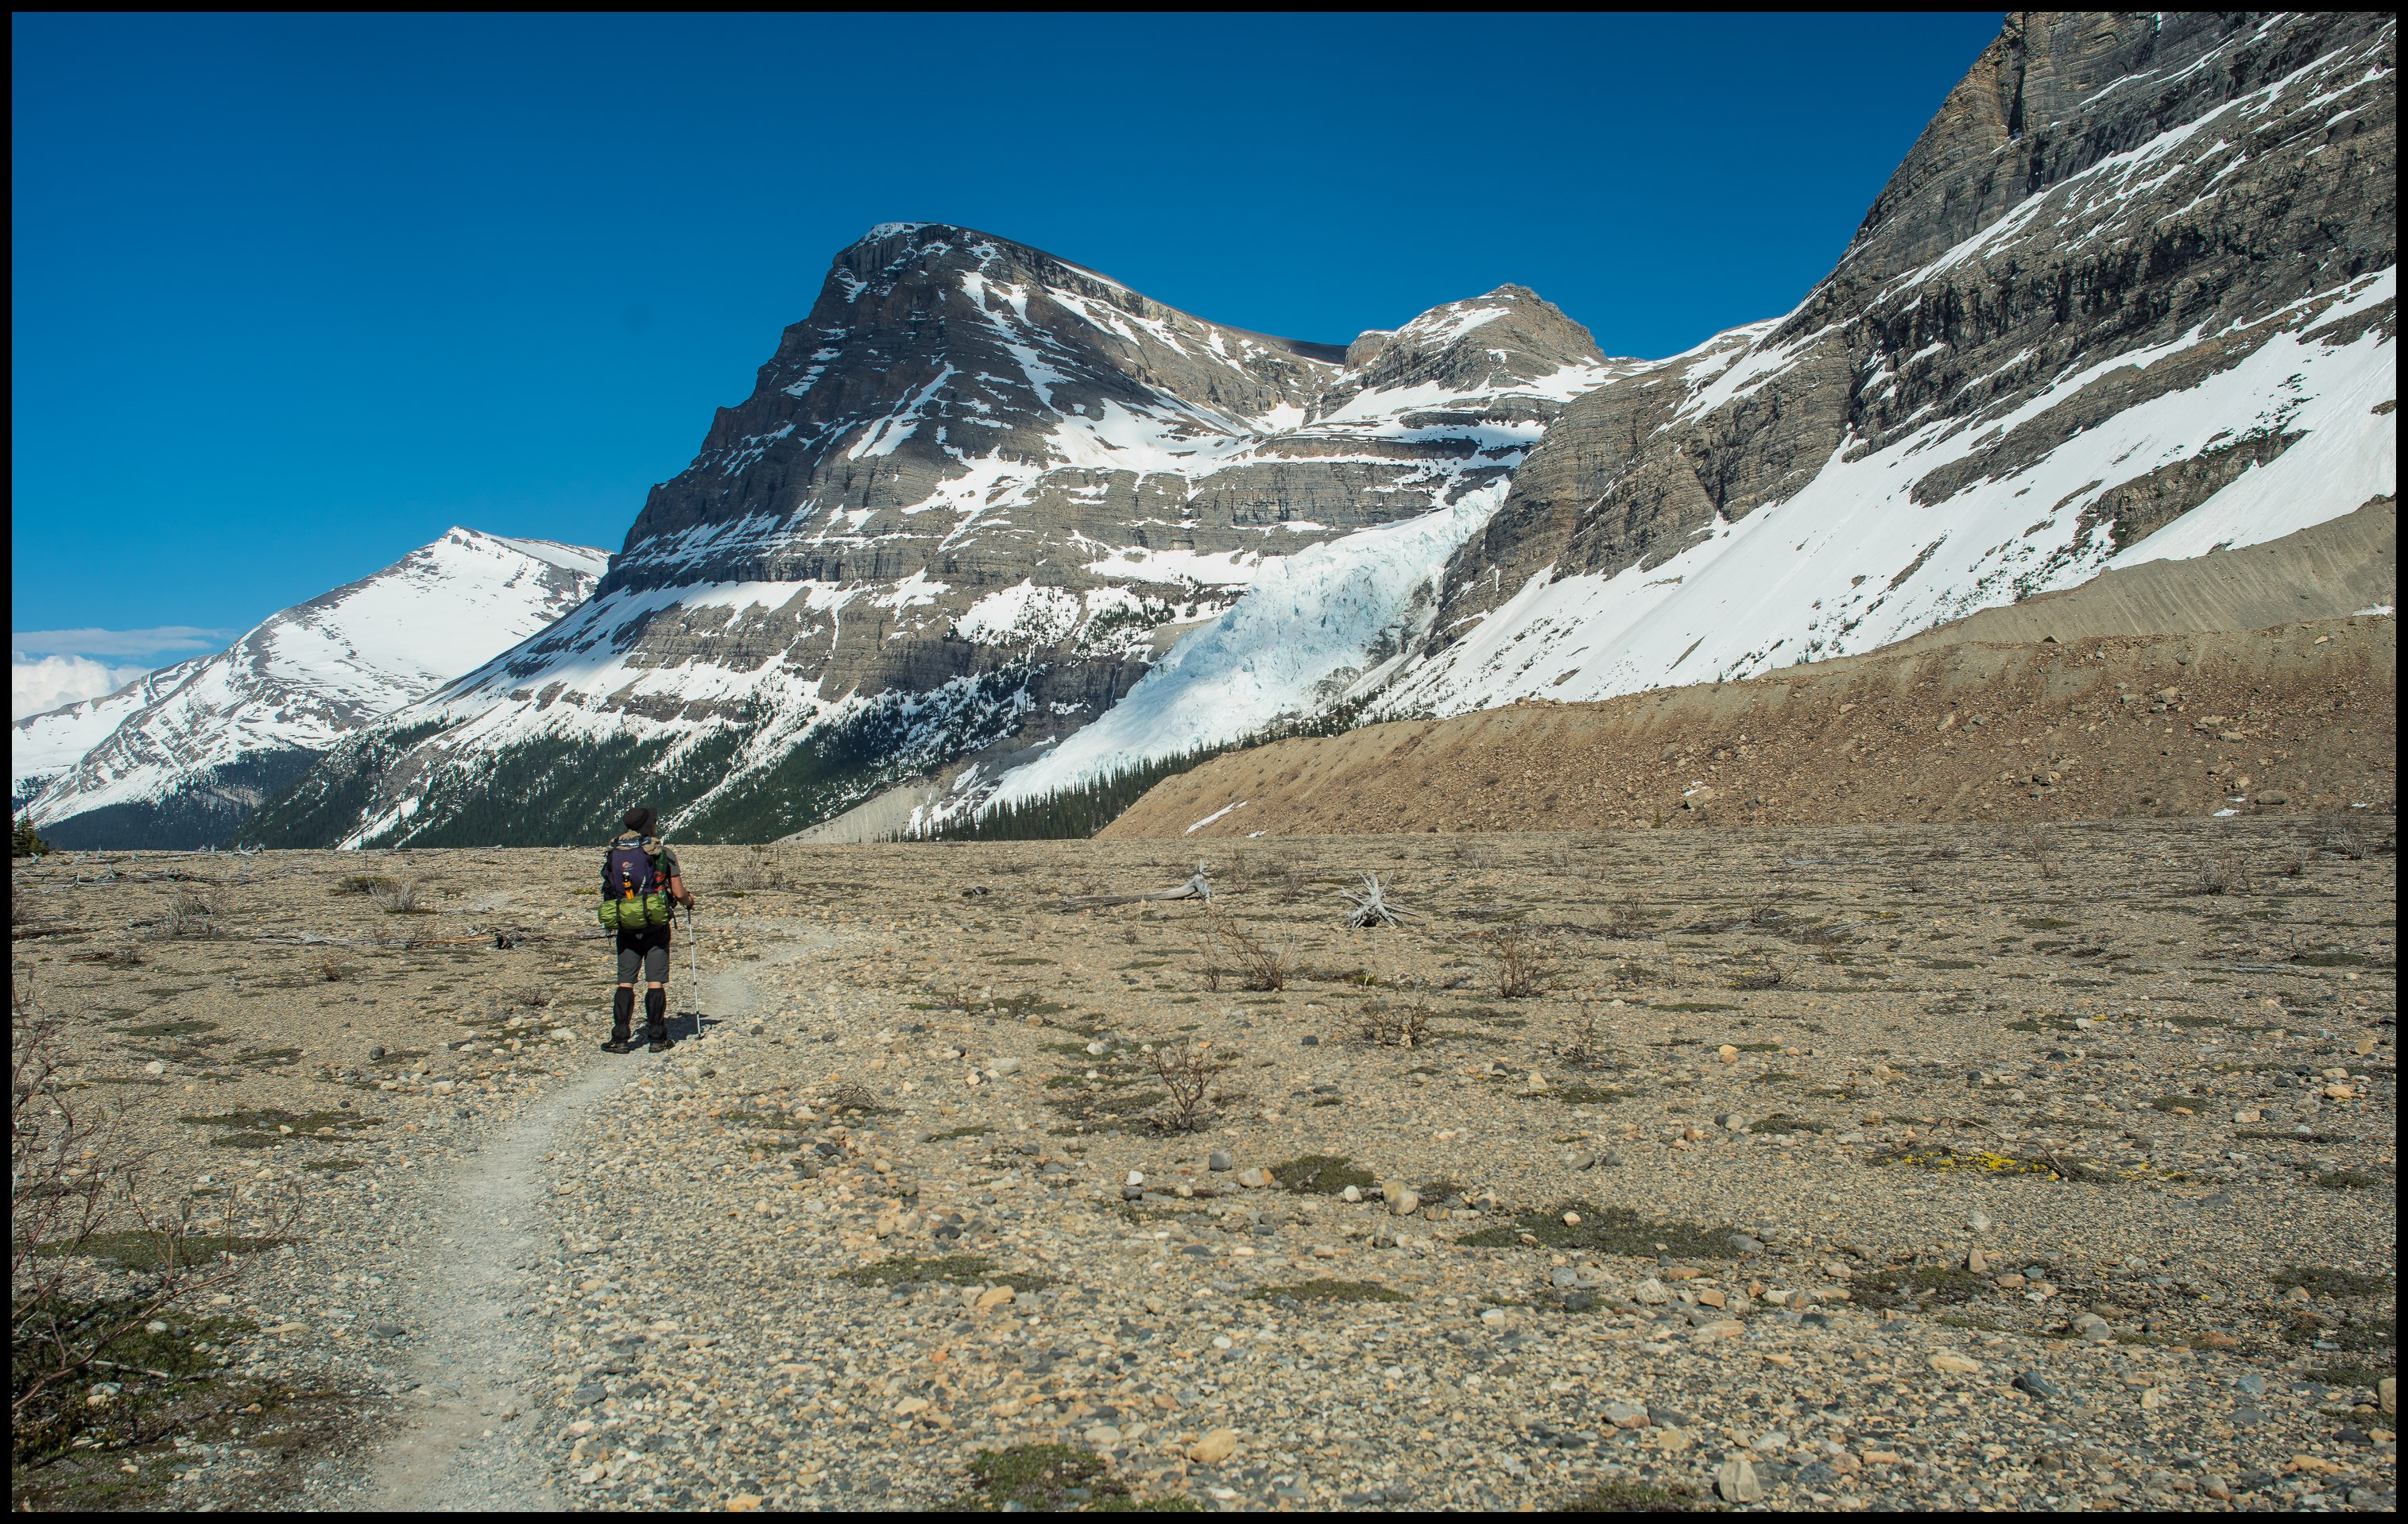 Scenery close to Marmot campsite on Berg Lake Trail Sony A7 / Canon FD Tilt Shift 35 2.8